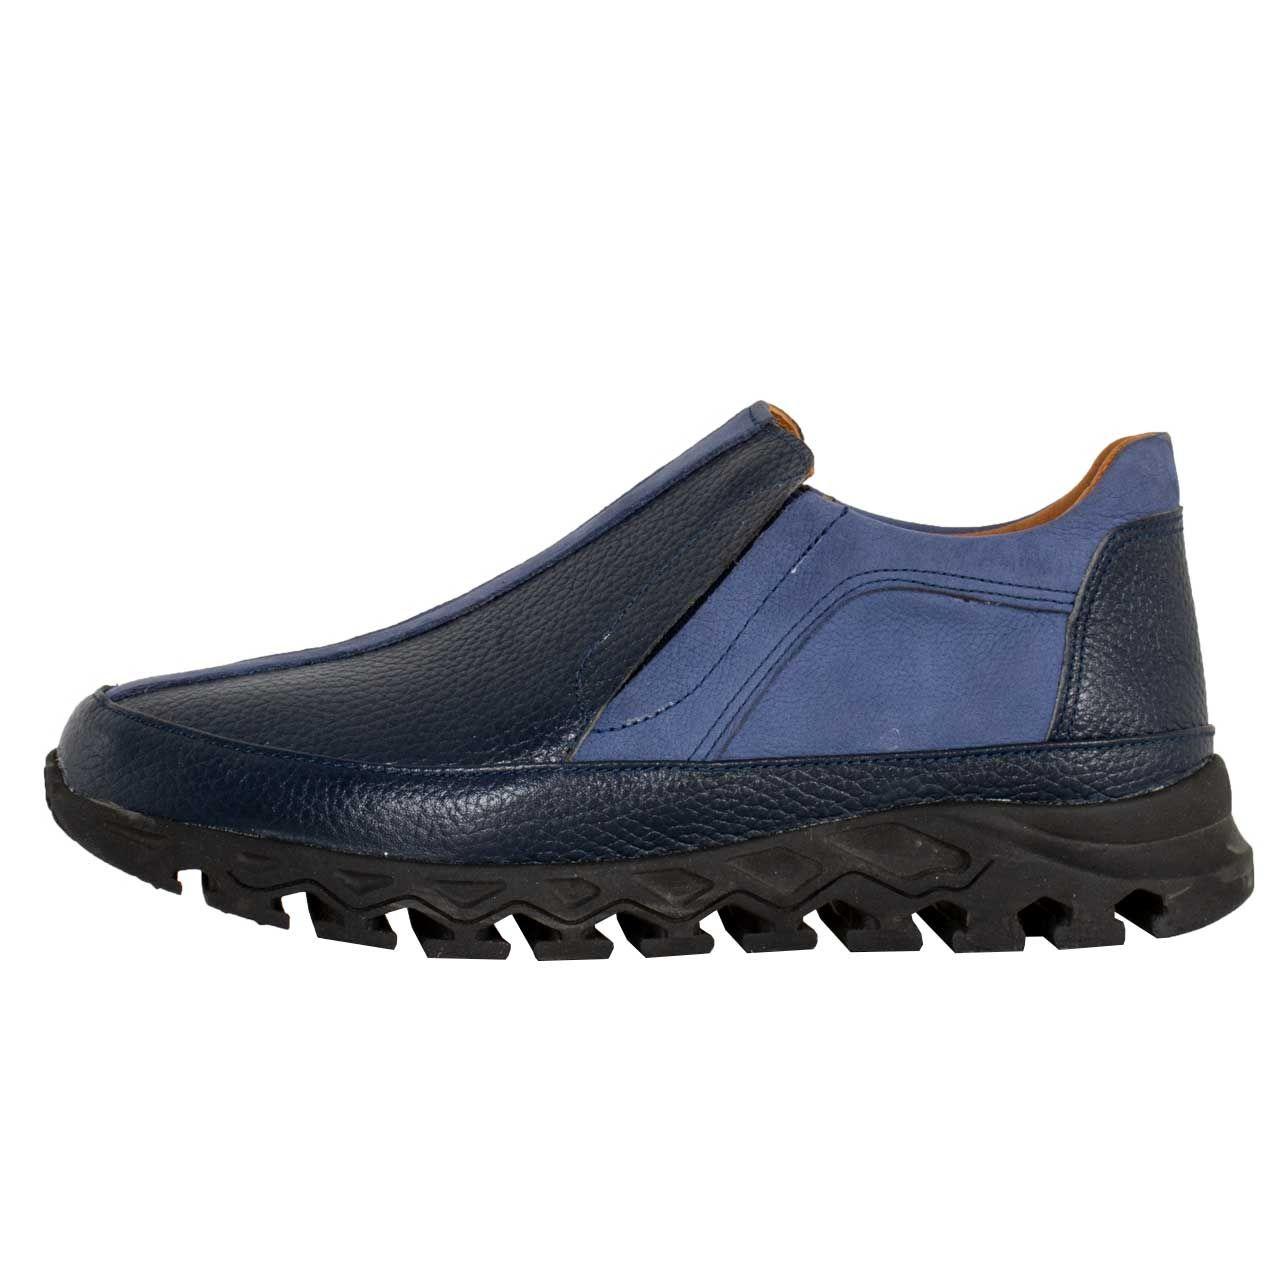 کفش روزمره زنانه پارینه چرم مدل SHOW42-11